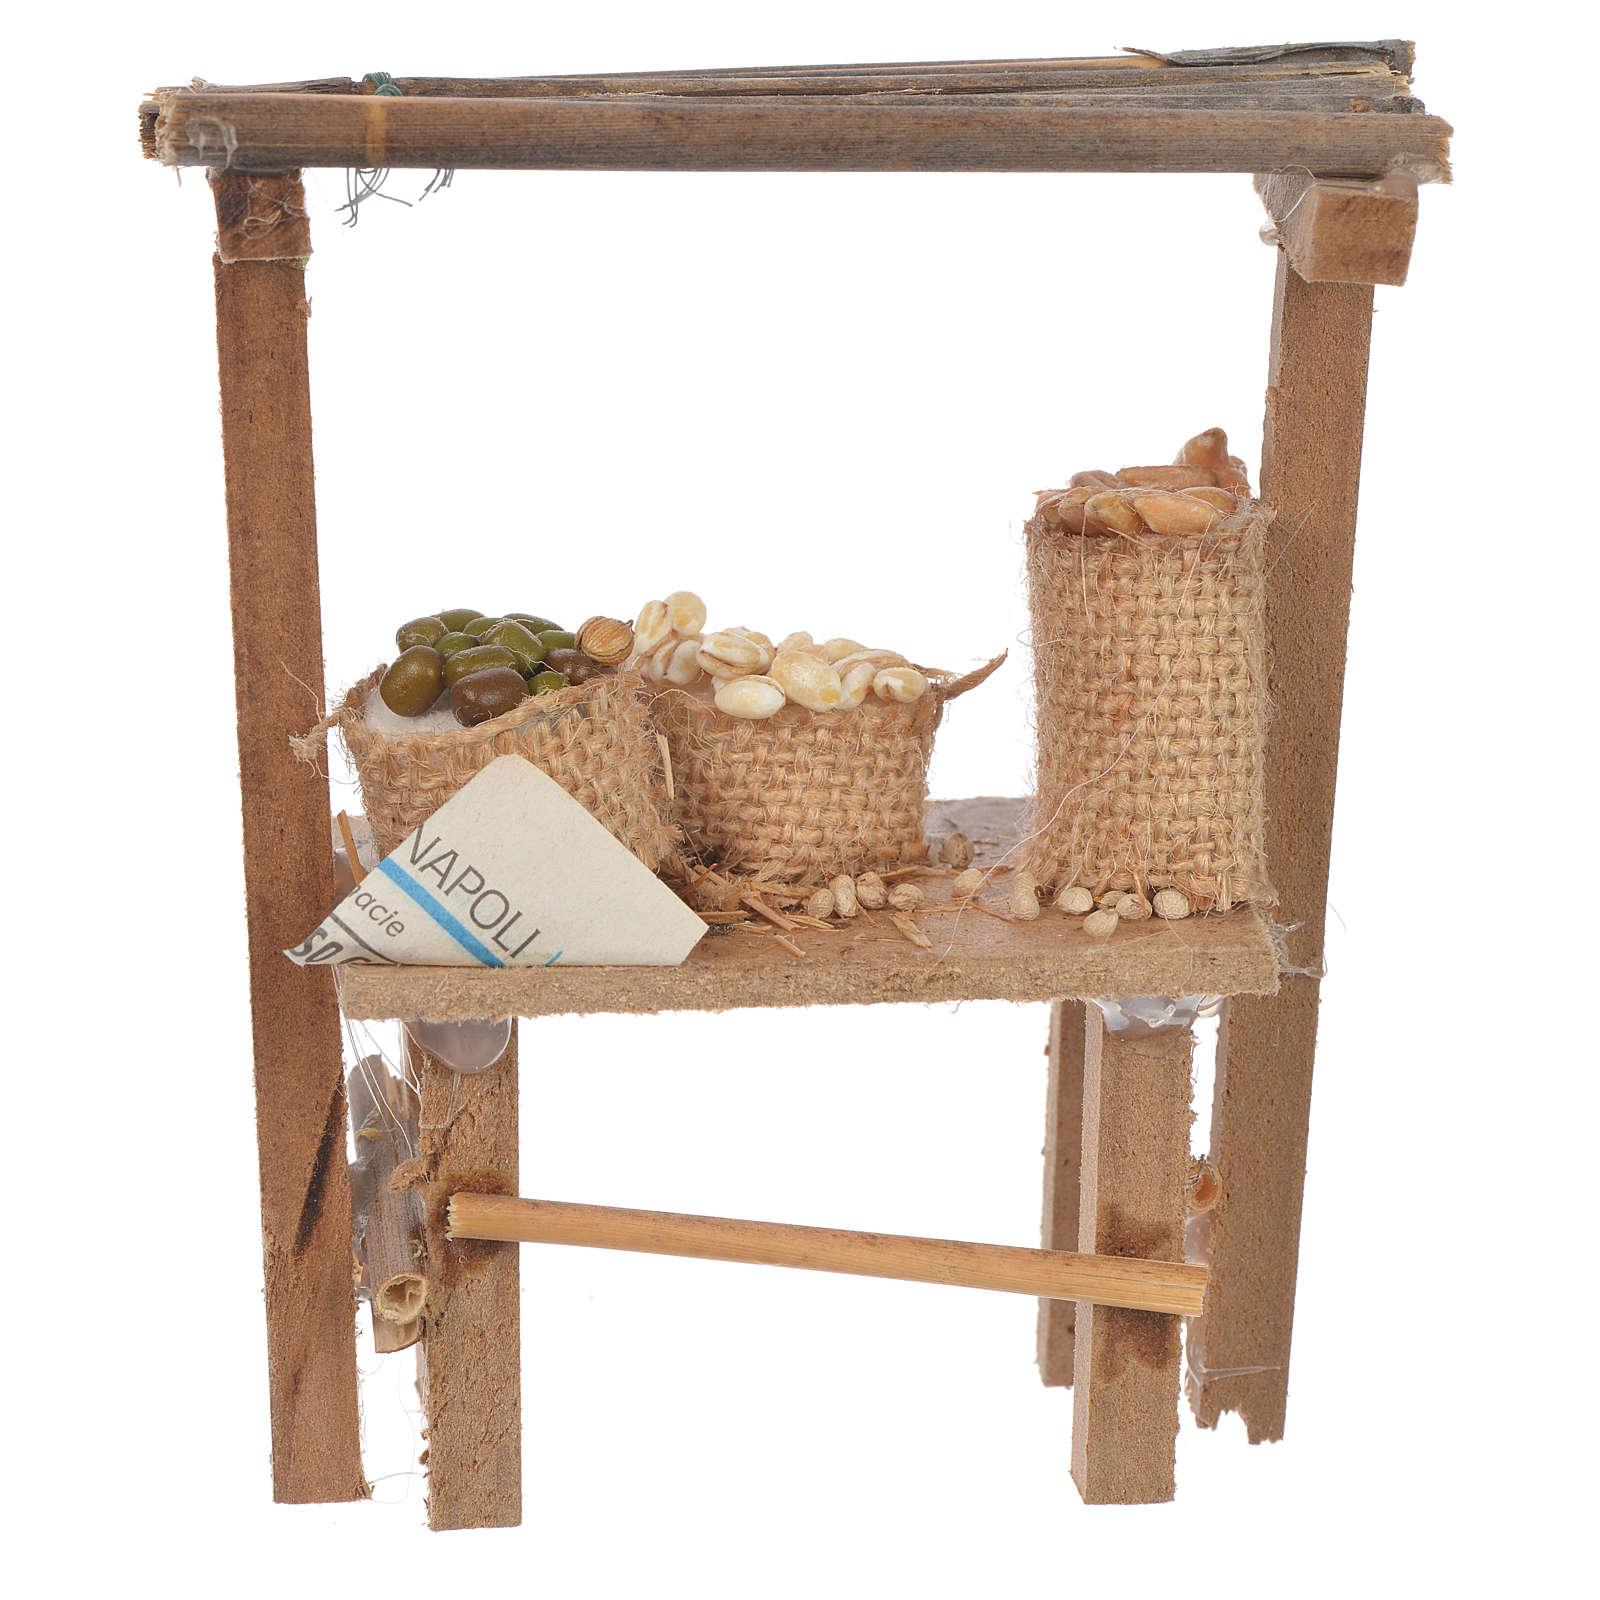 Banco legno cereali olive cera presepe 9x10x4,5 cm 4